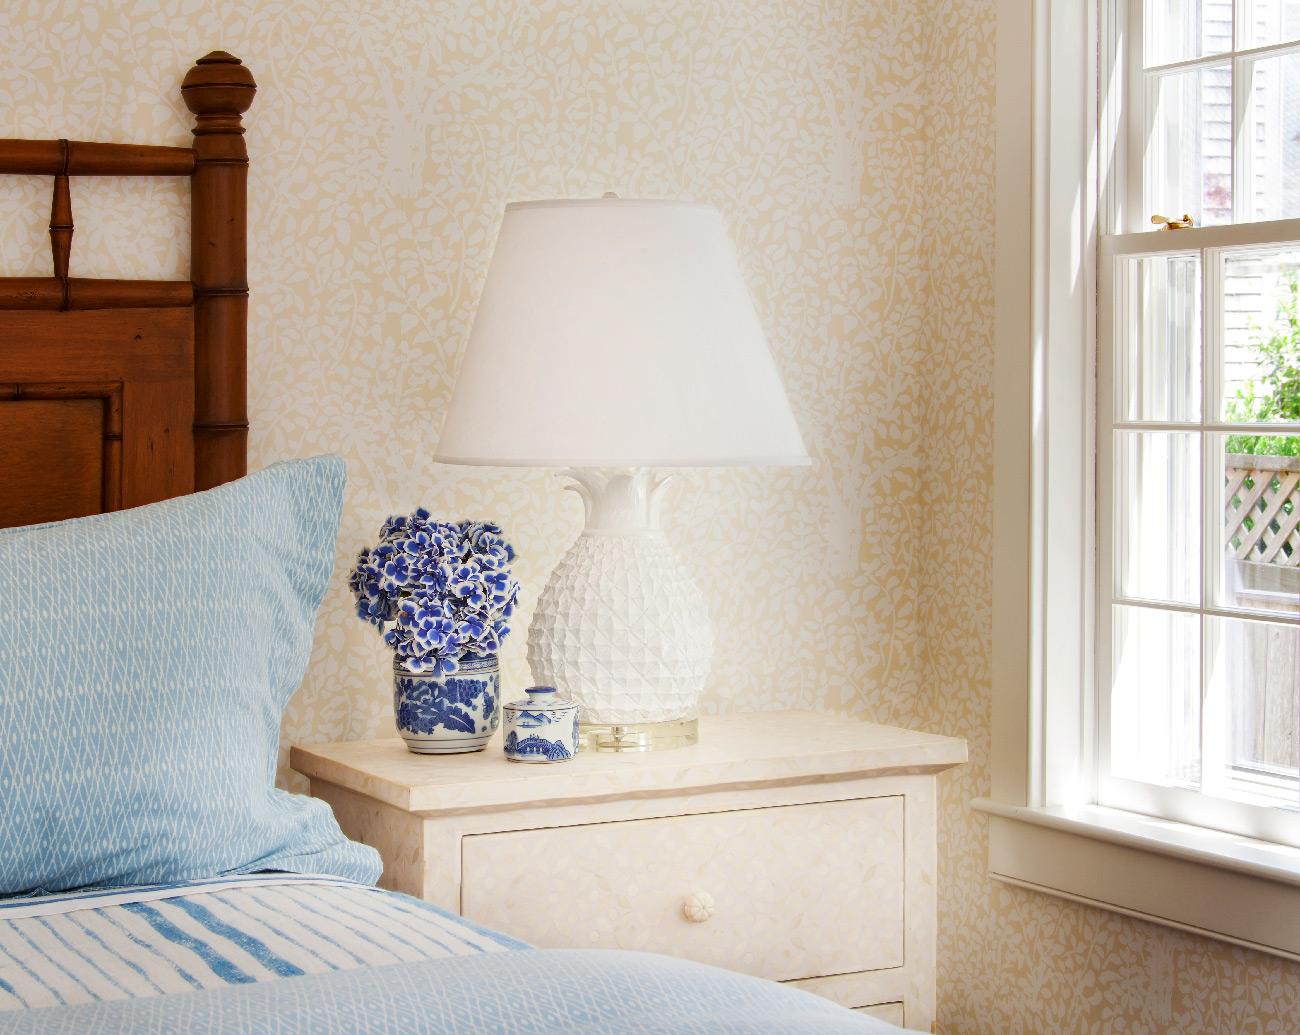 Harding & Company Design - Nantucket No. 1